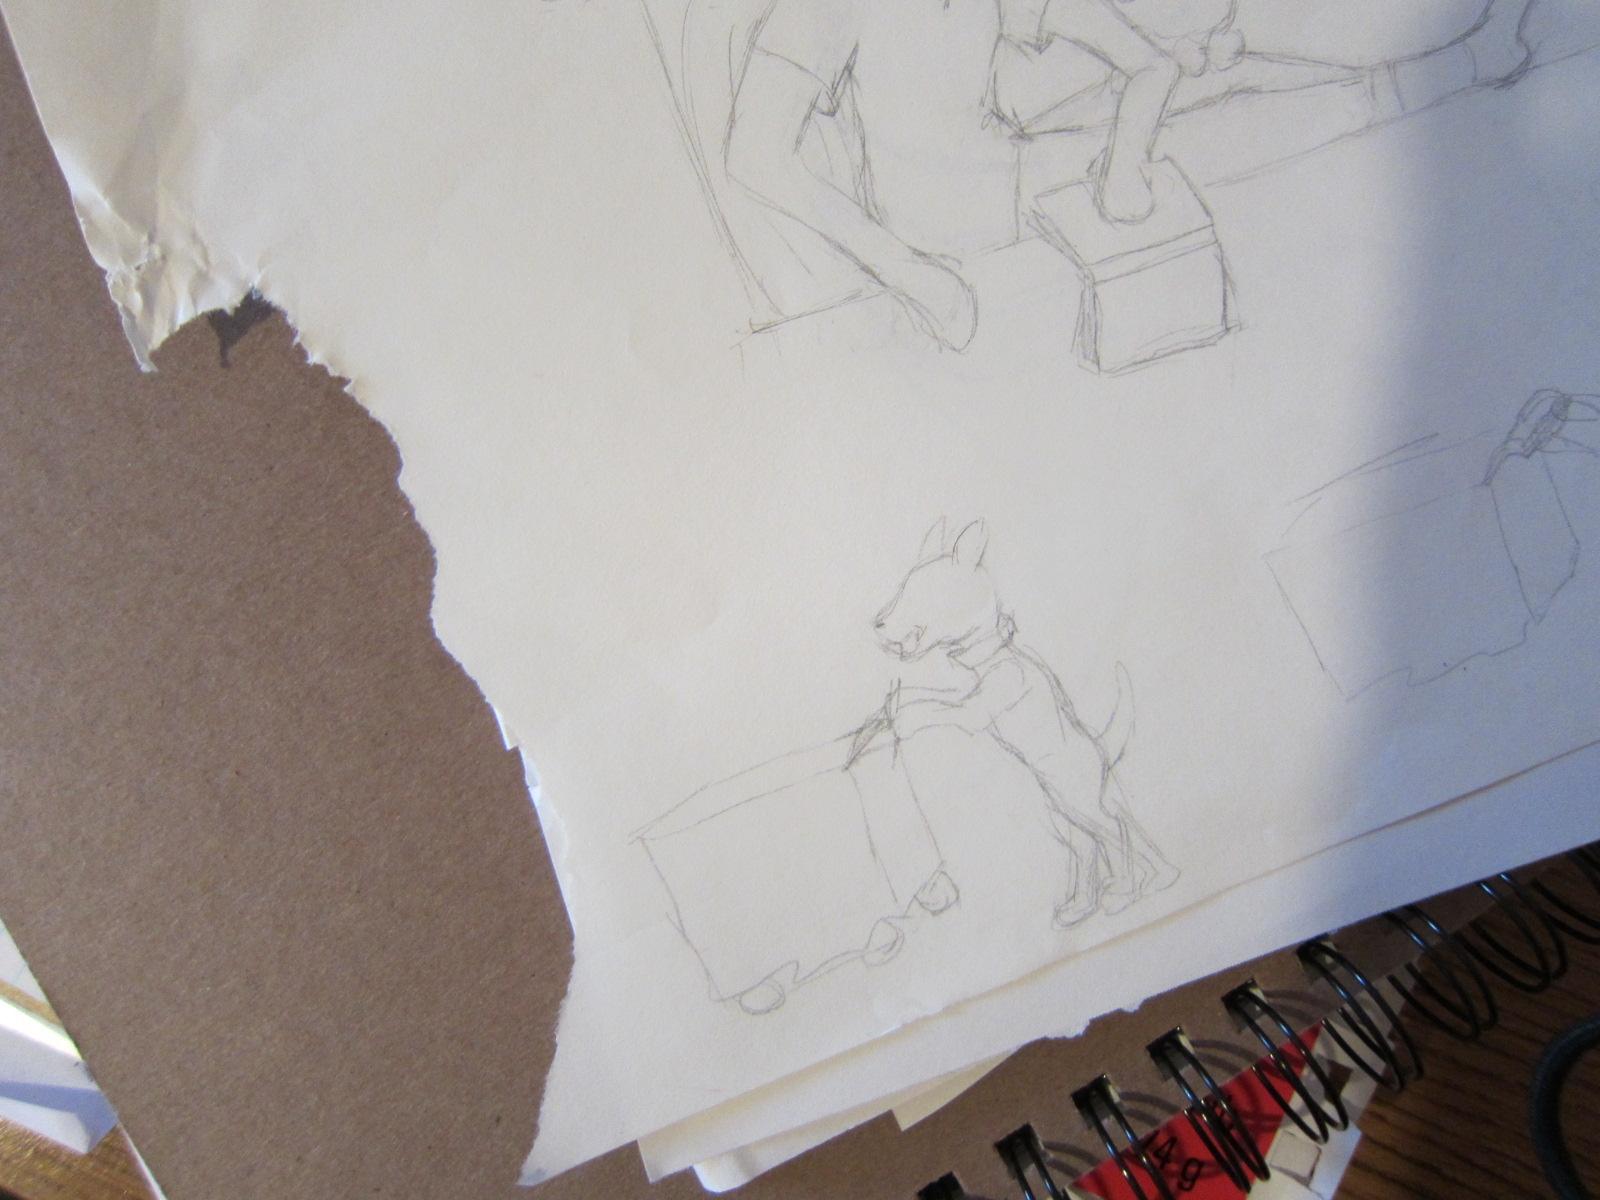 Dog-chewed sketch paper